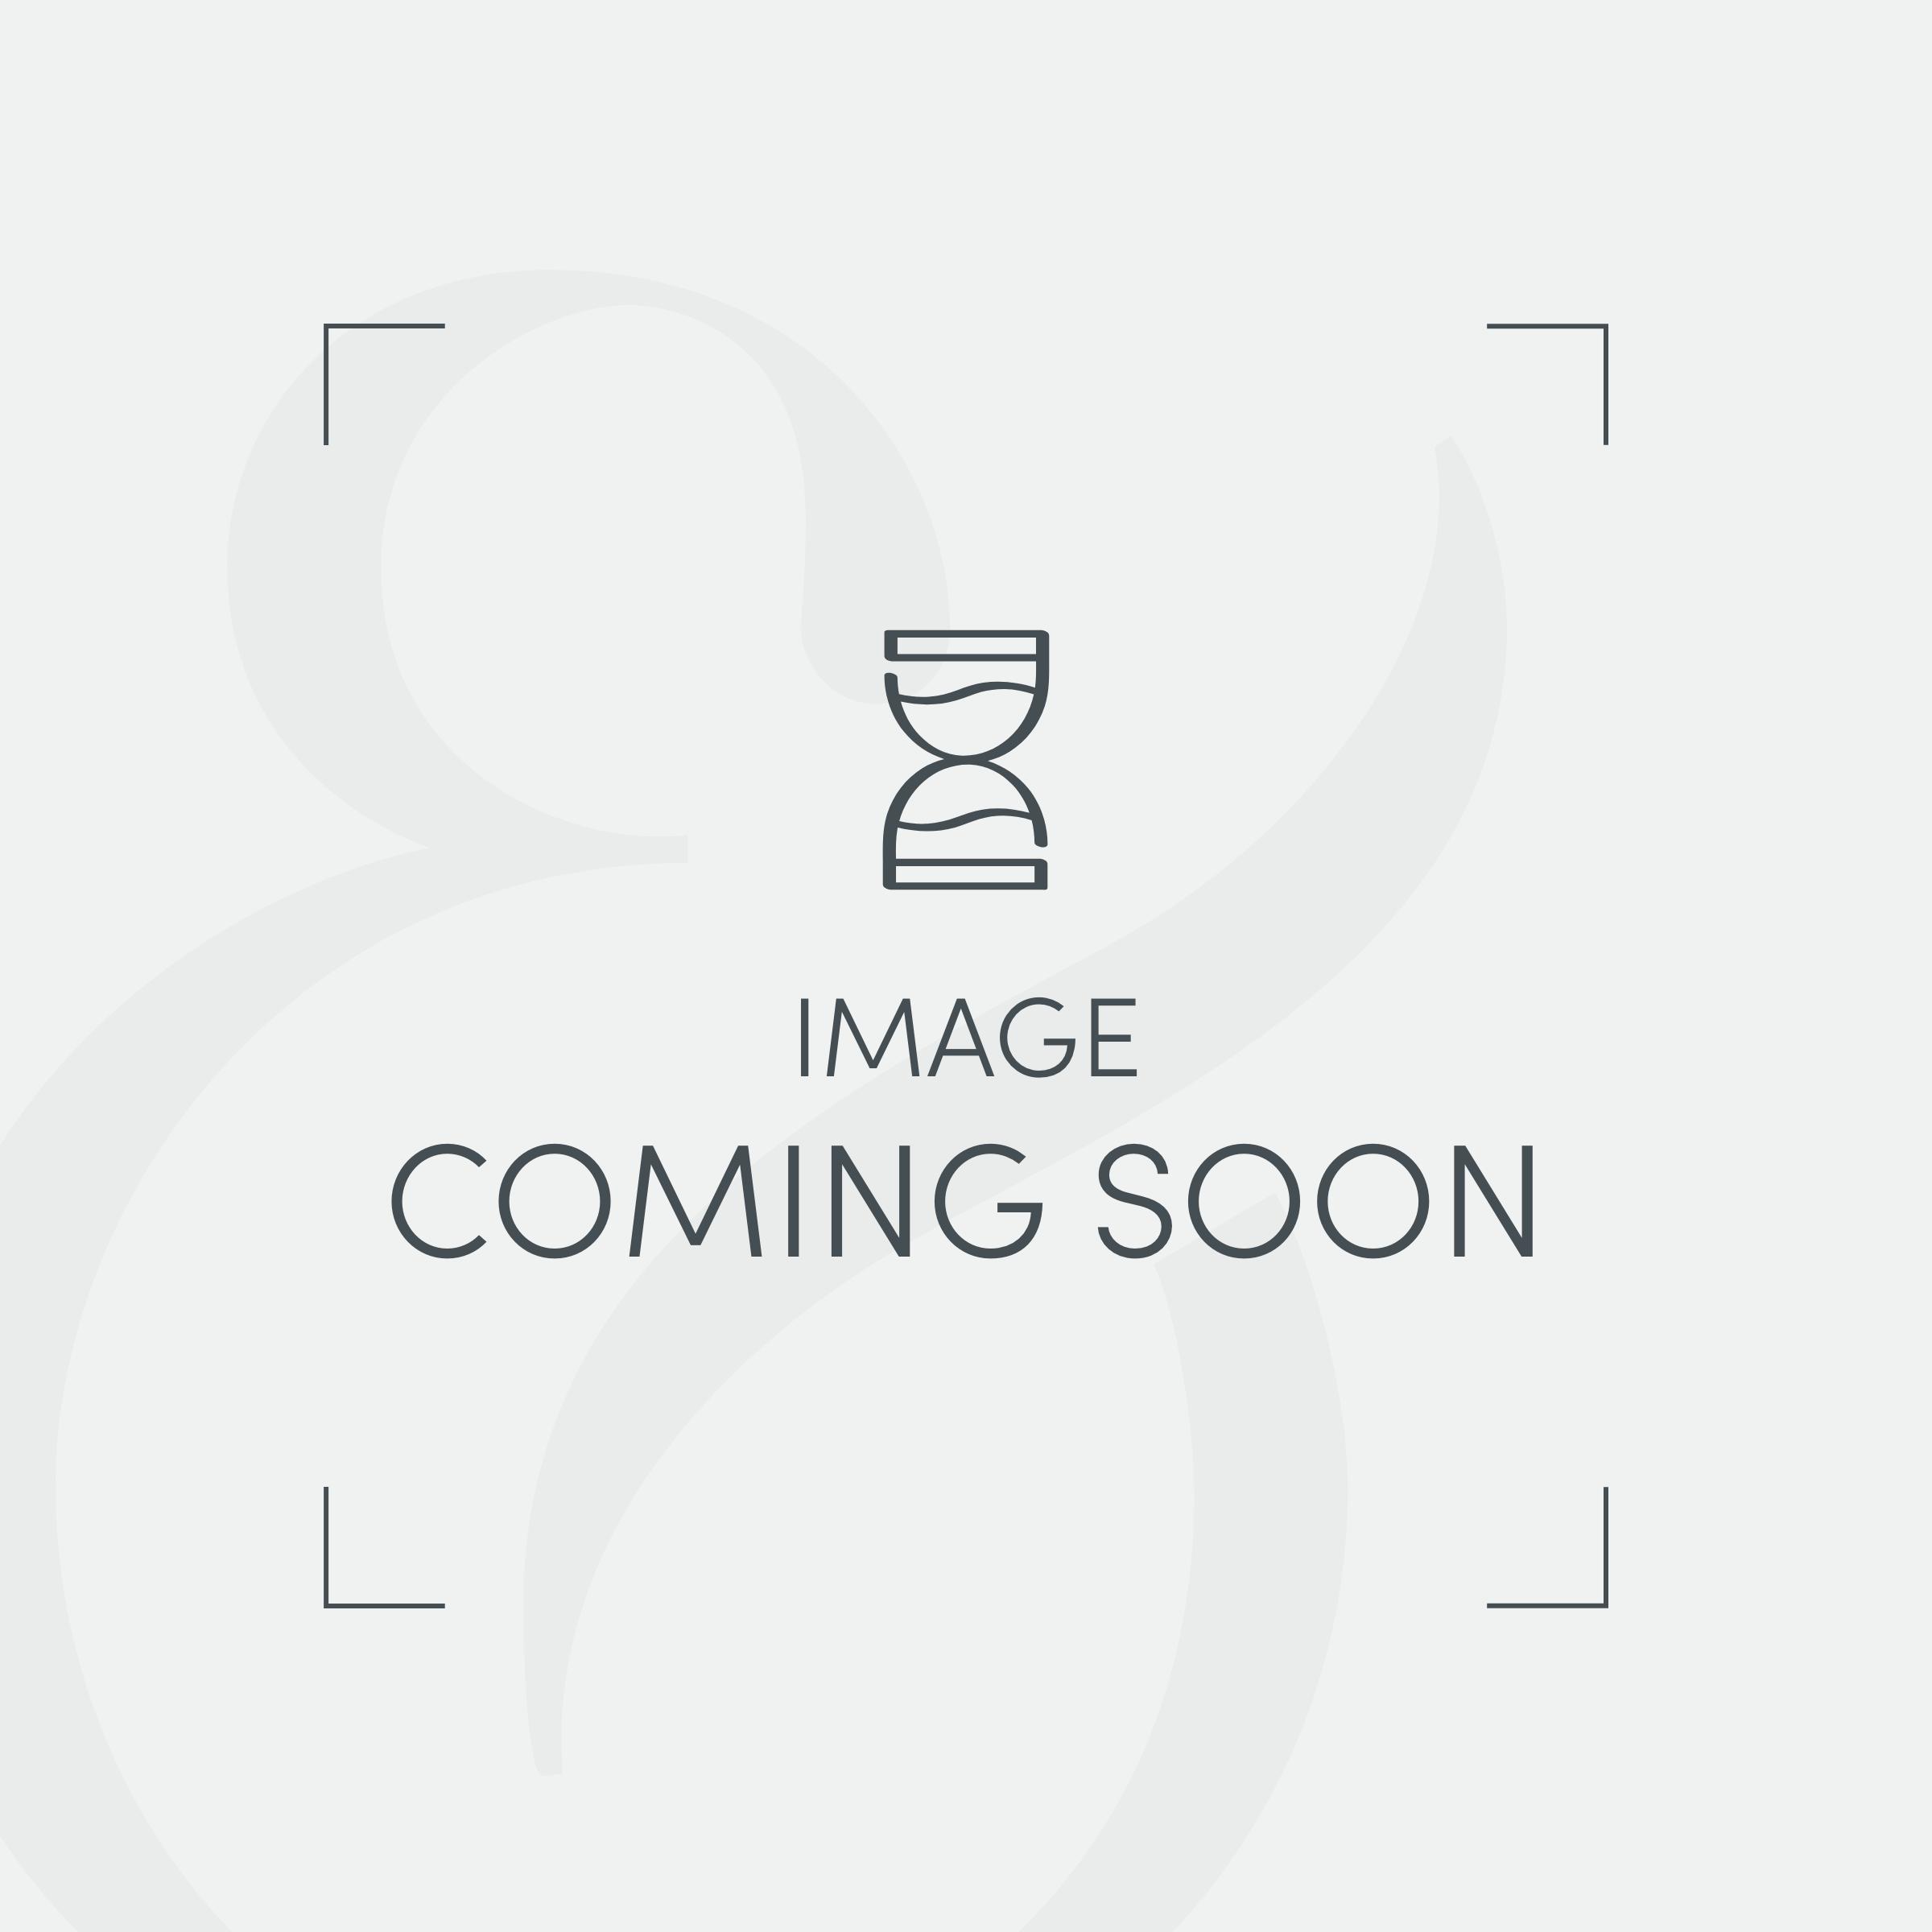 Egyptian Towel Bundles - 4 Packs